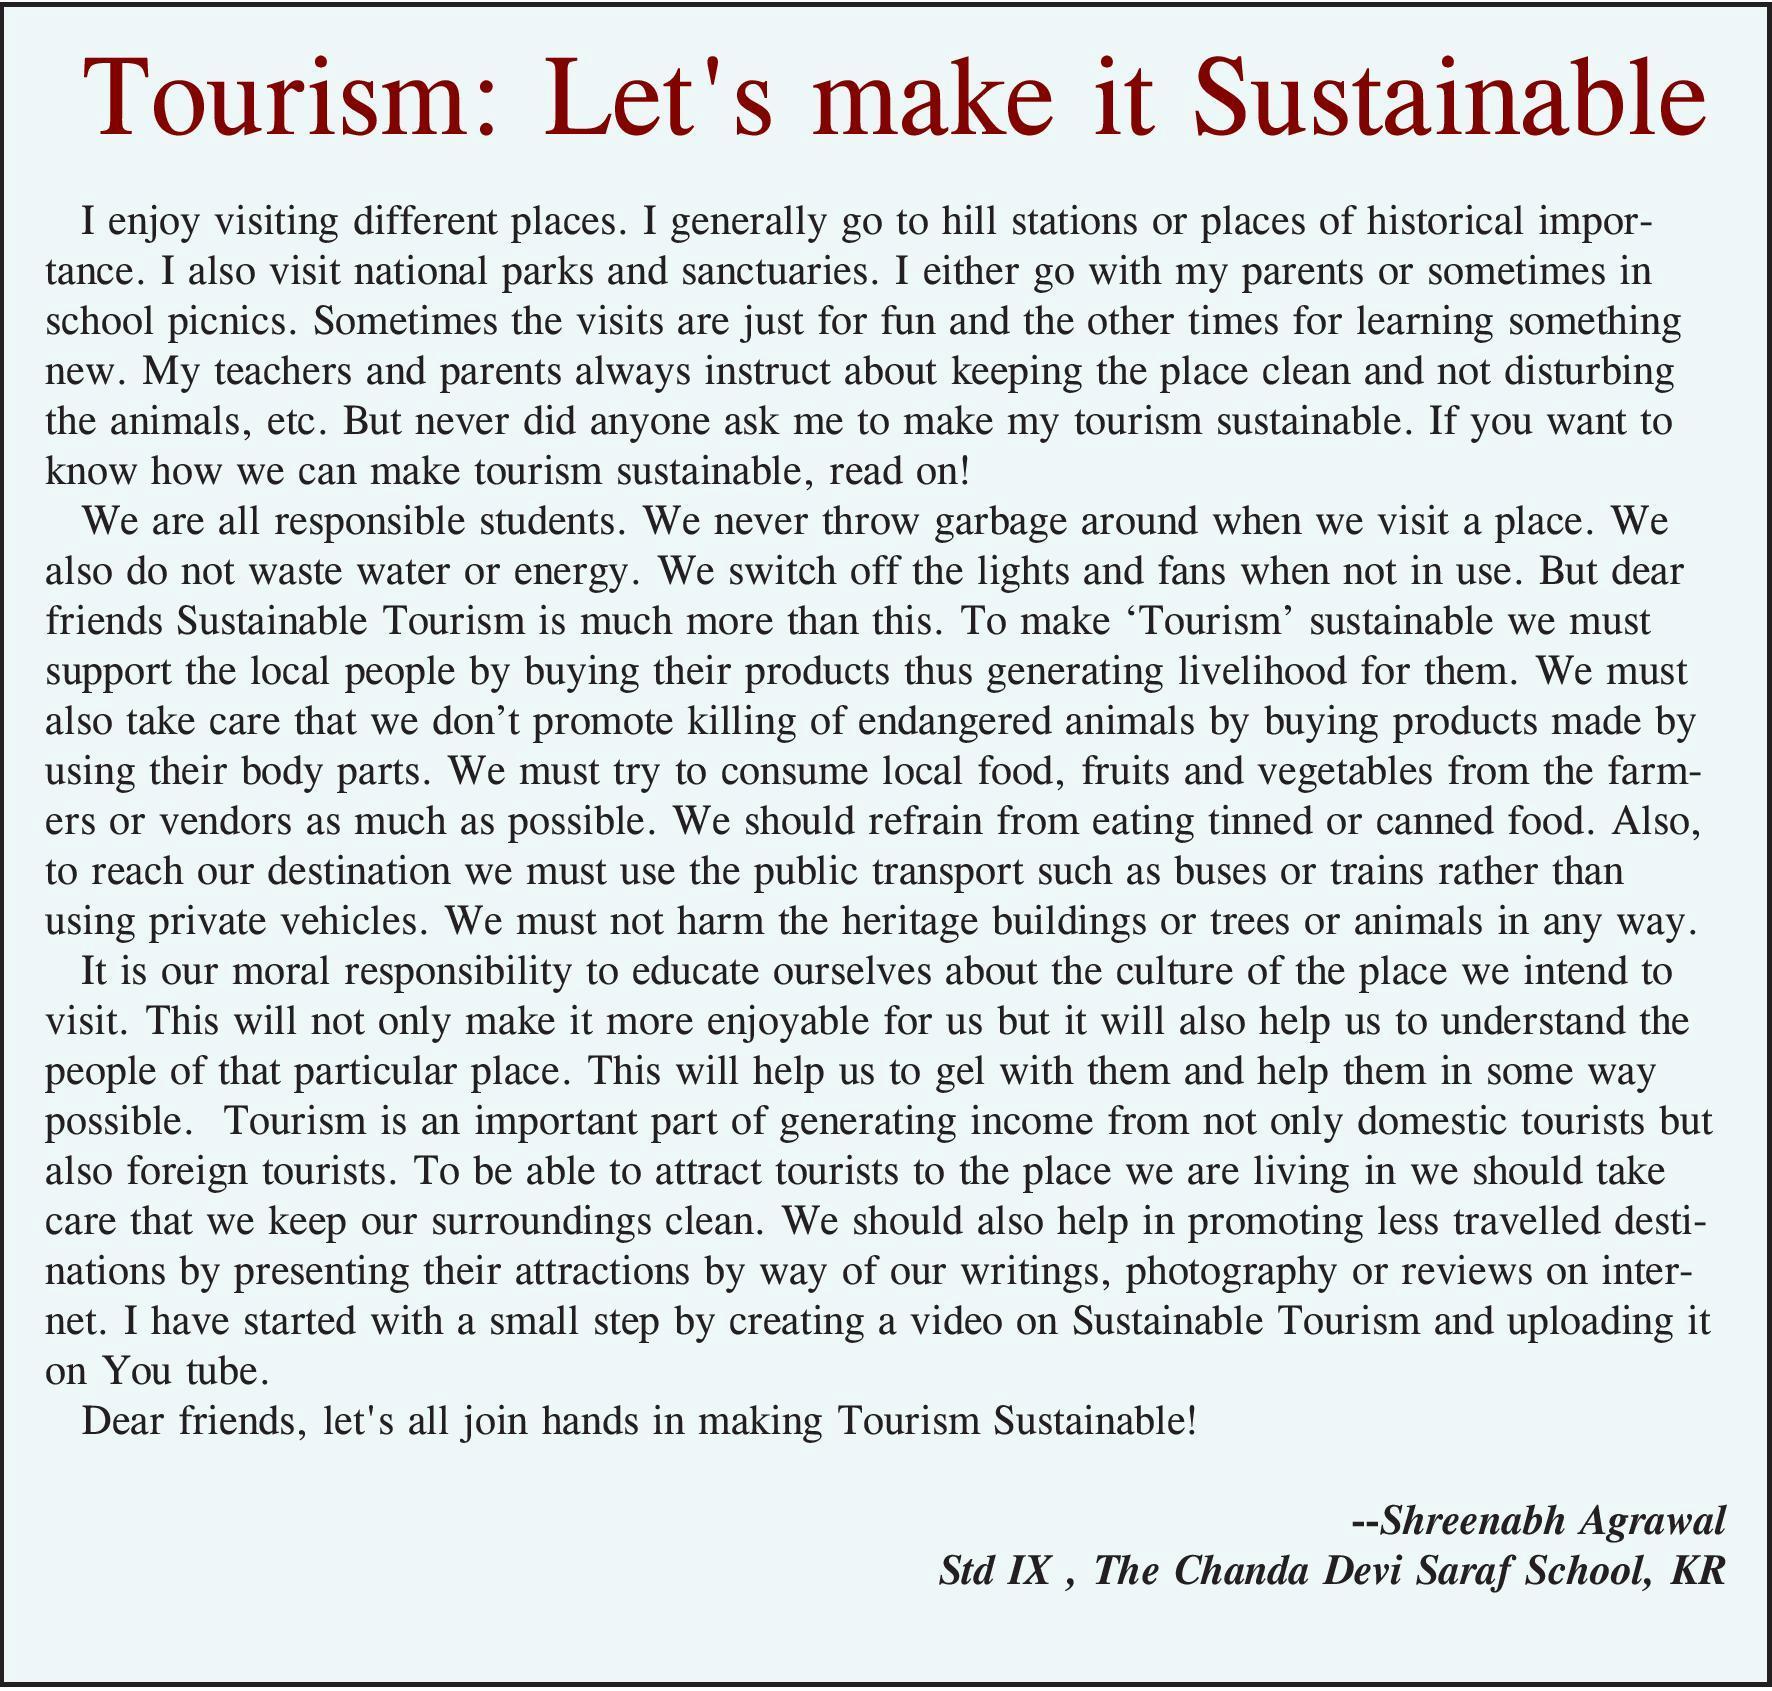 /srv/www/vhosts/user3101/html/entrepreneurship-campus.org/wp-content/uploads/2019/06/article-tourism-Shreenabh-1.jpg